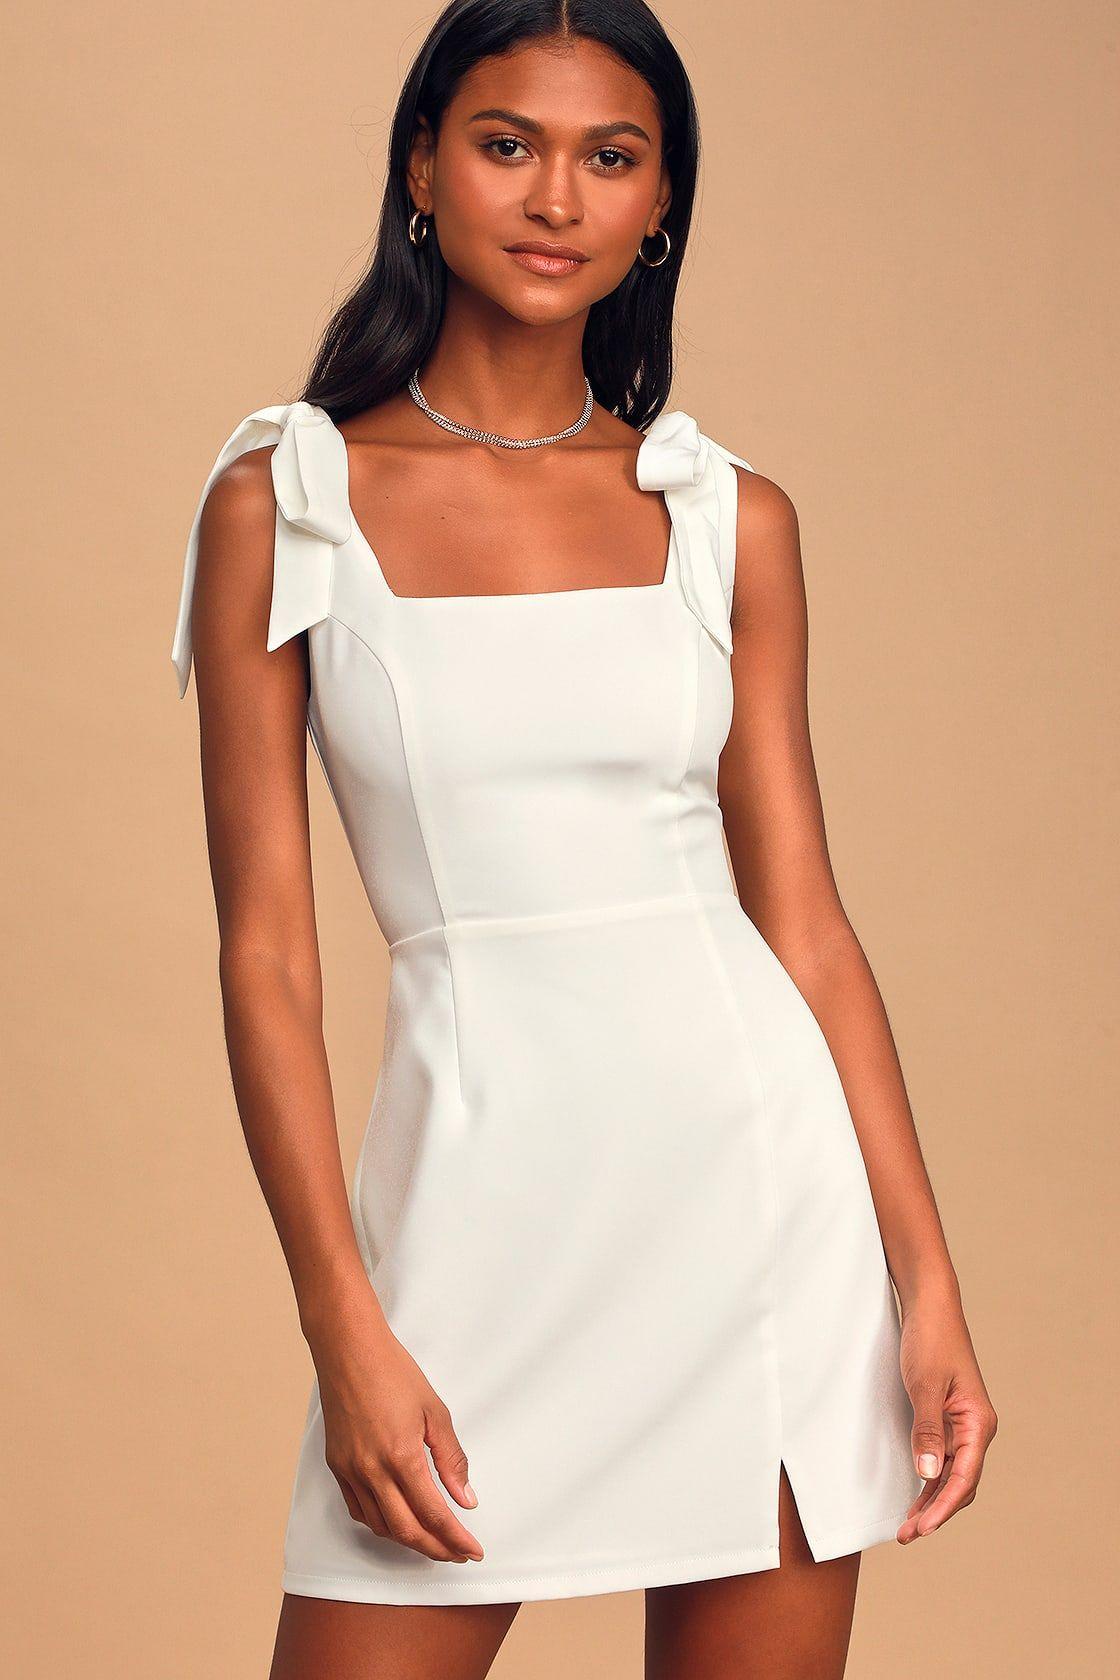 Your Sweetie White Tie Strap Mini Dress Short Graduation Dresses Graduation Dress High School White Dresses Graduation [ 1680 x 1120 Pixel ]